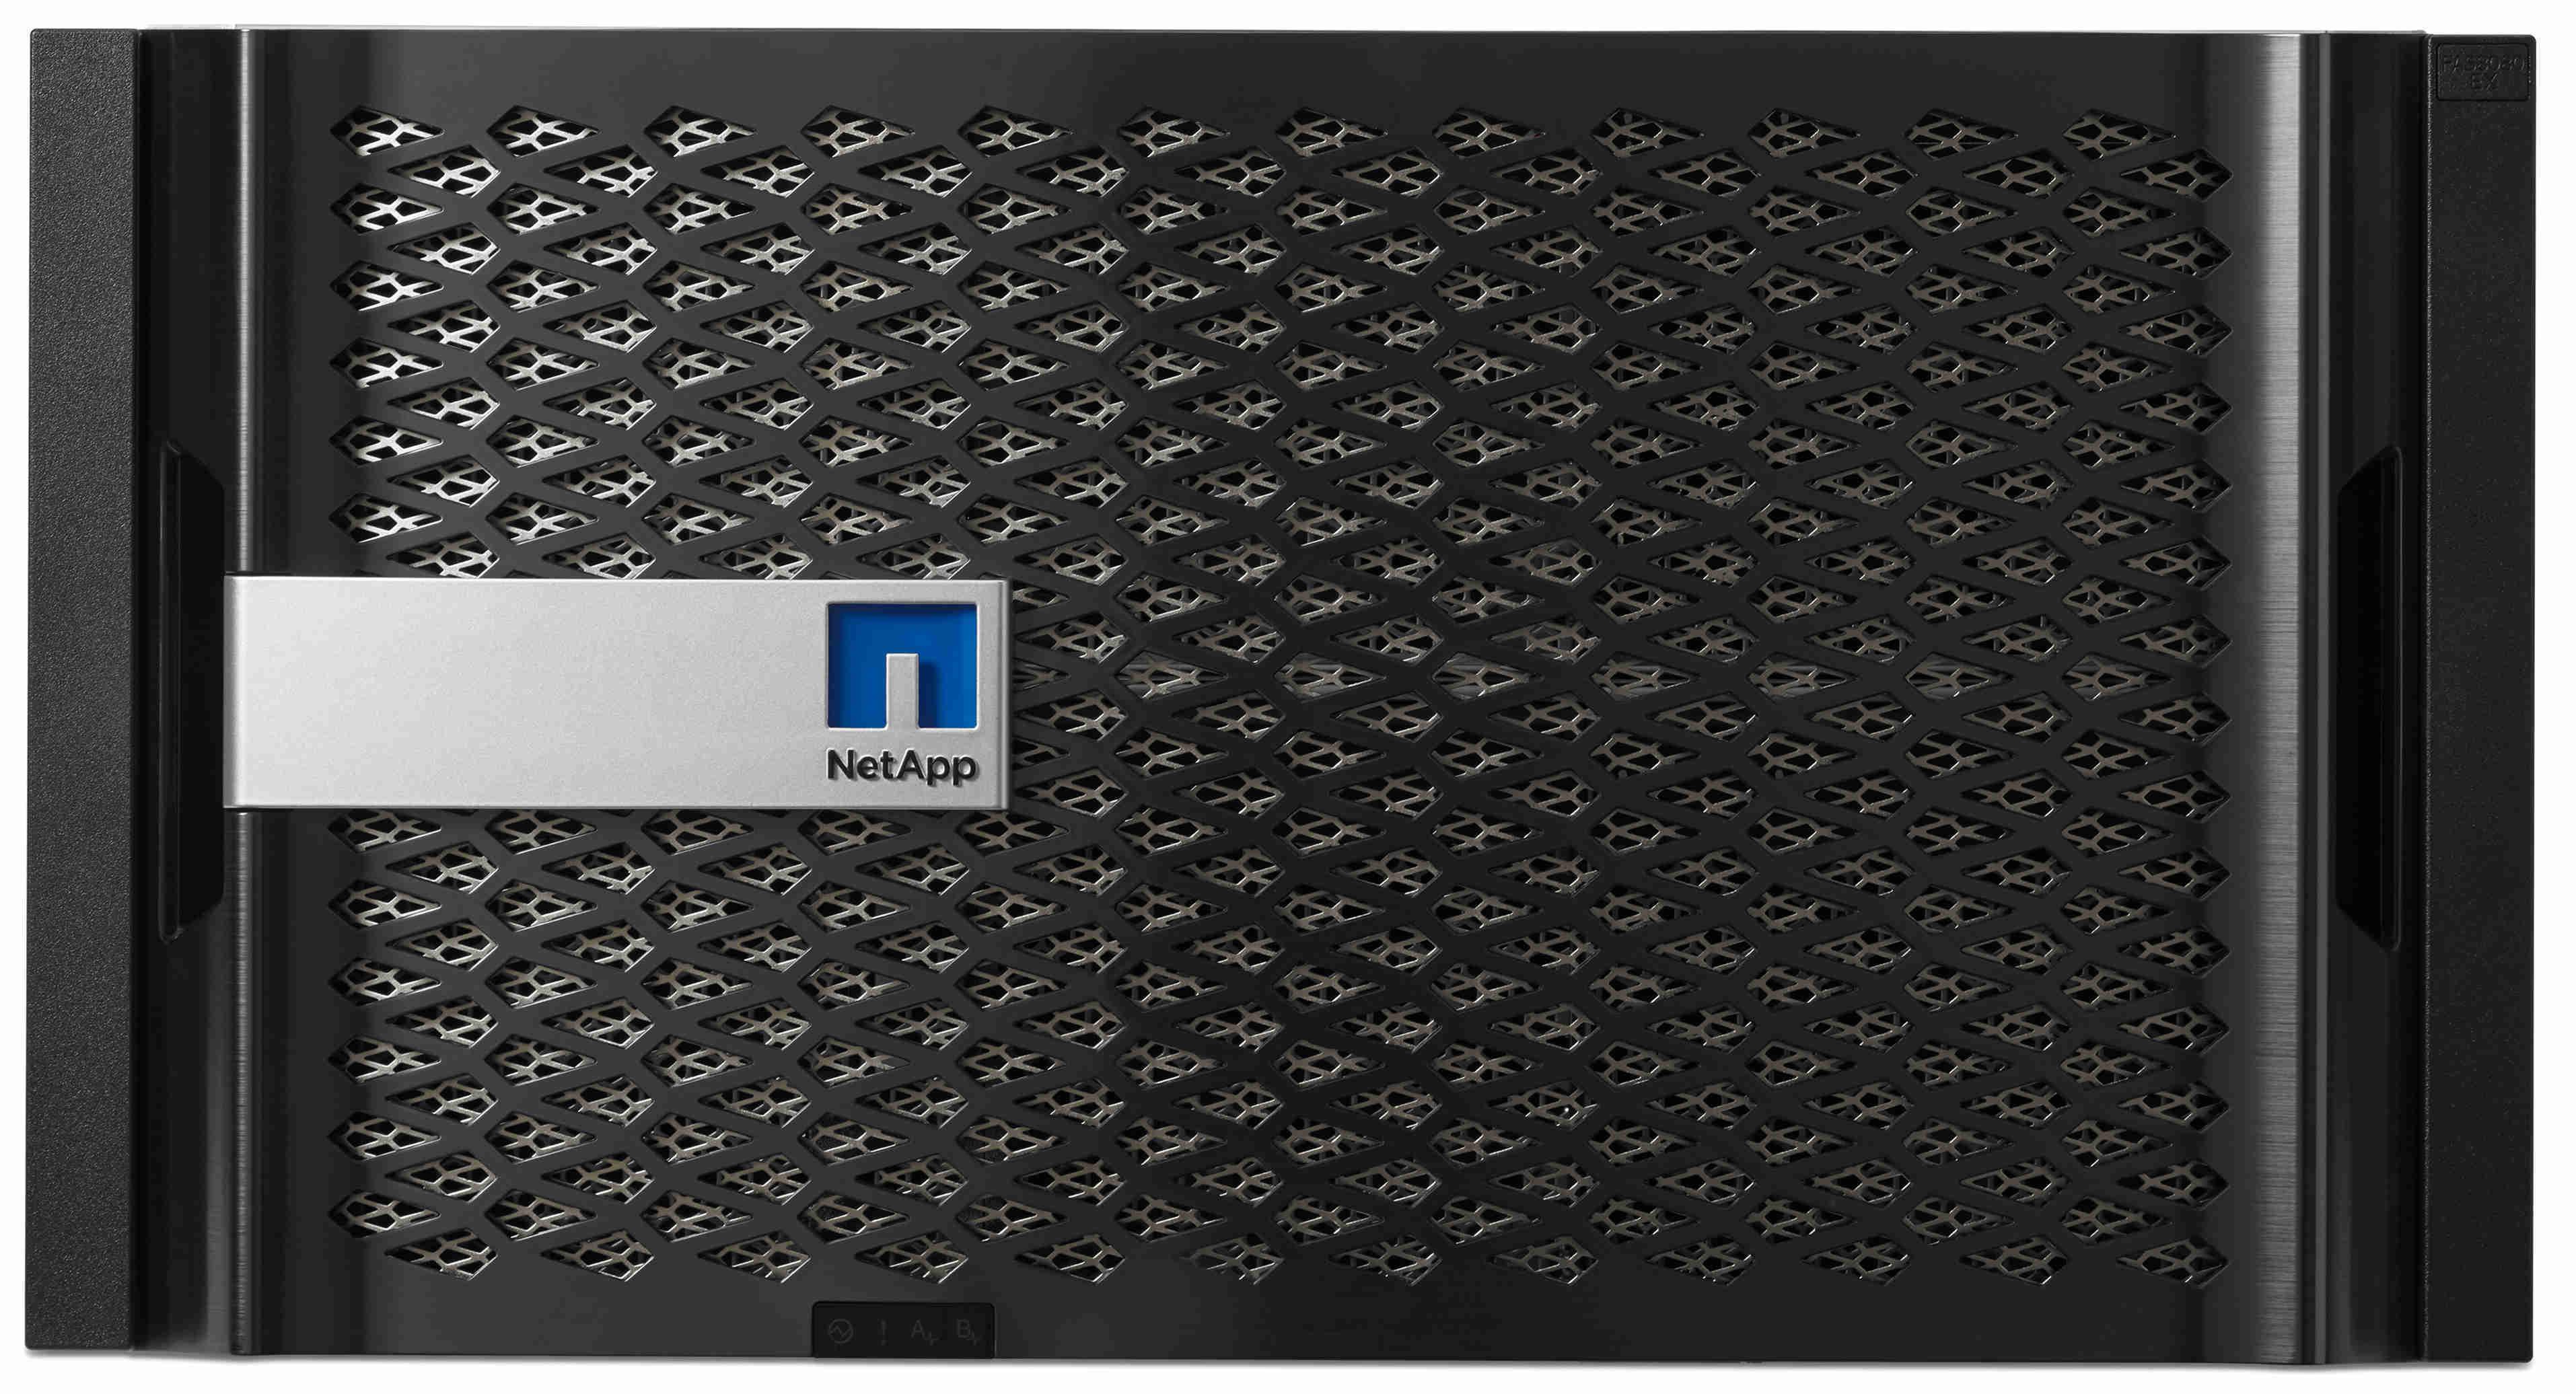 Netapp FAS 8080 Storage System